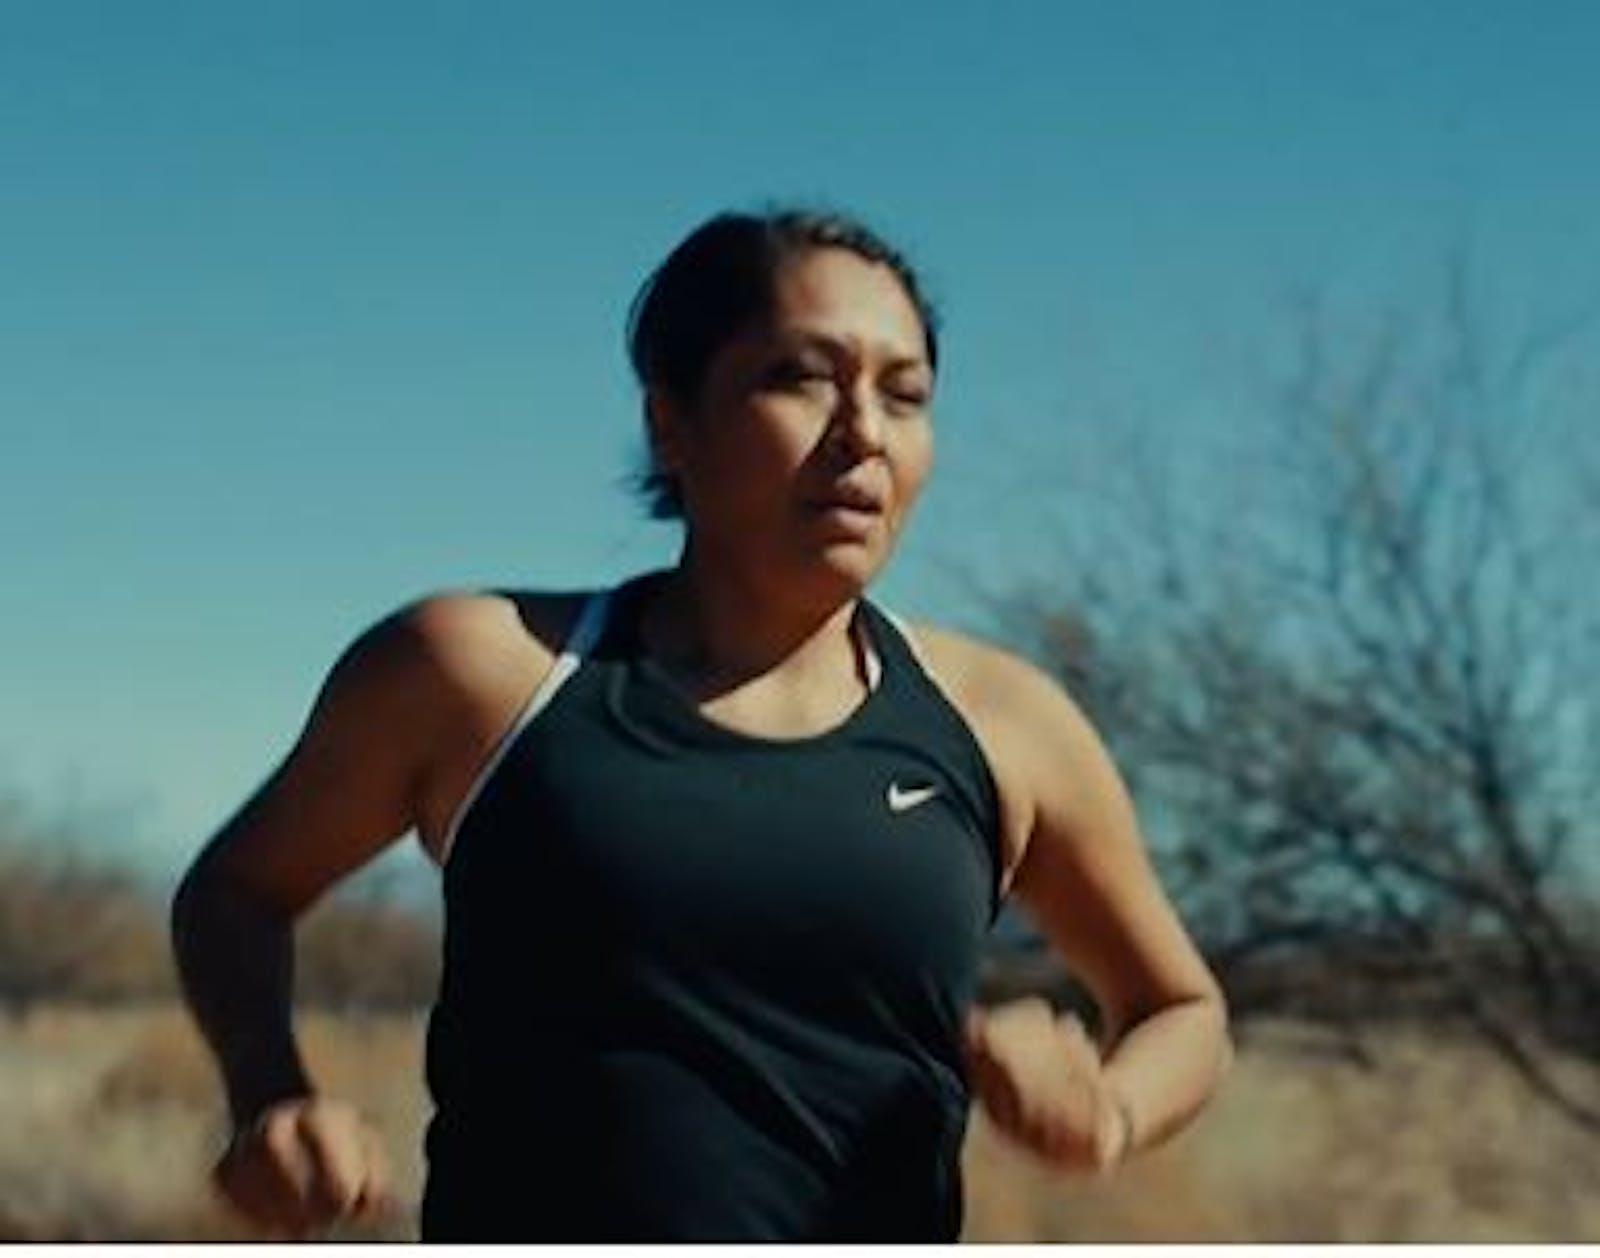 Woman in black tank top running in desert